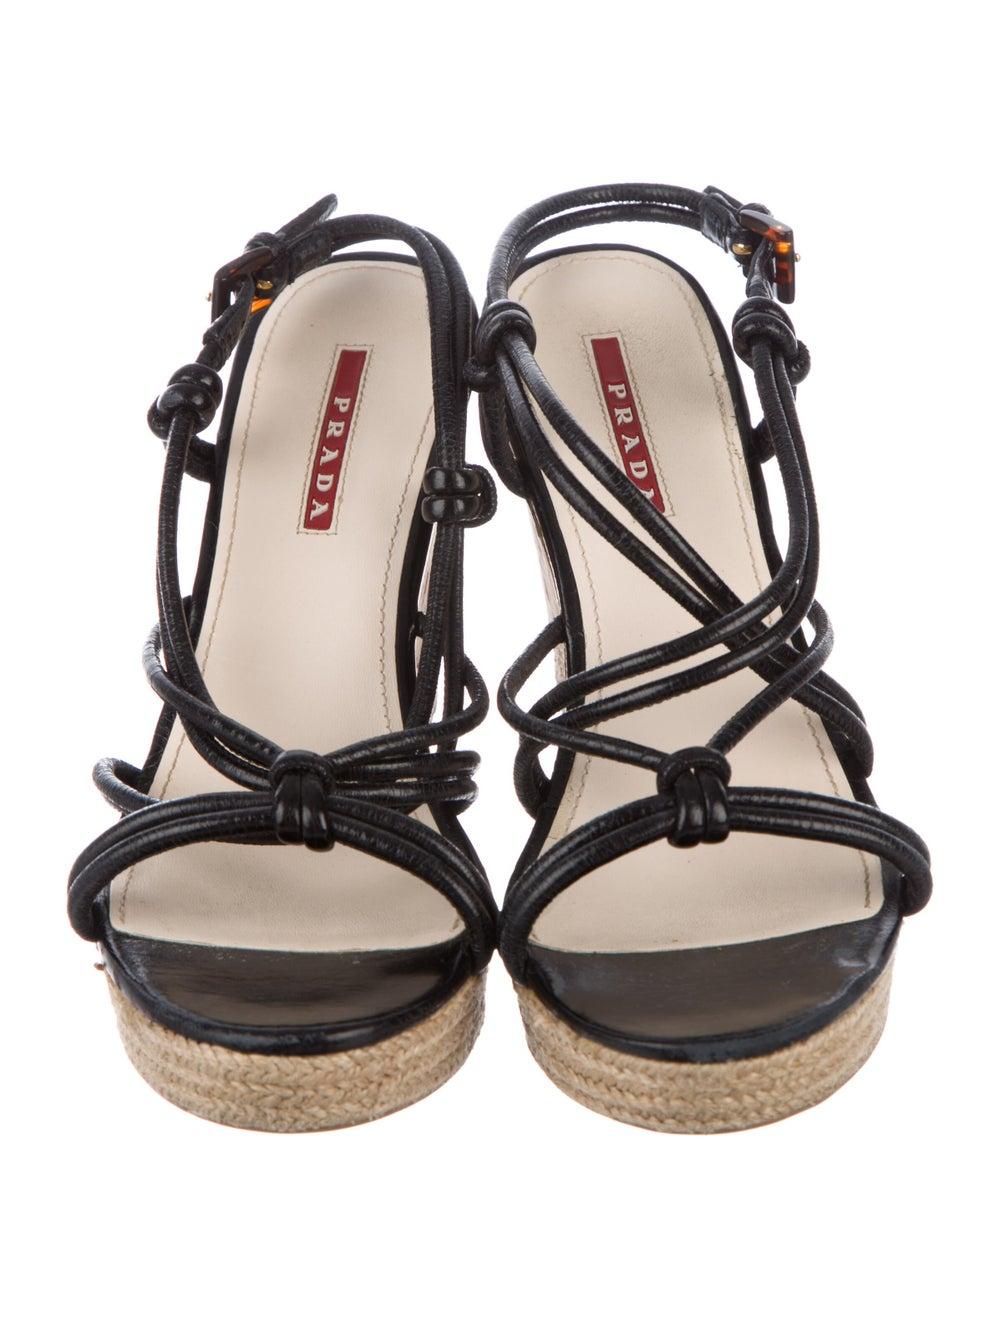 Prada Sport Leather Espadrilles Black - image 3